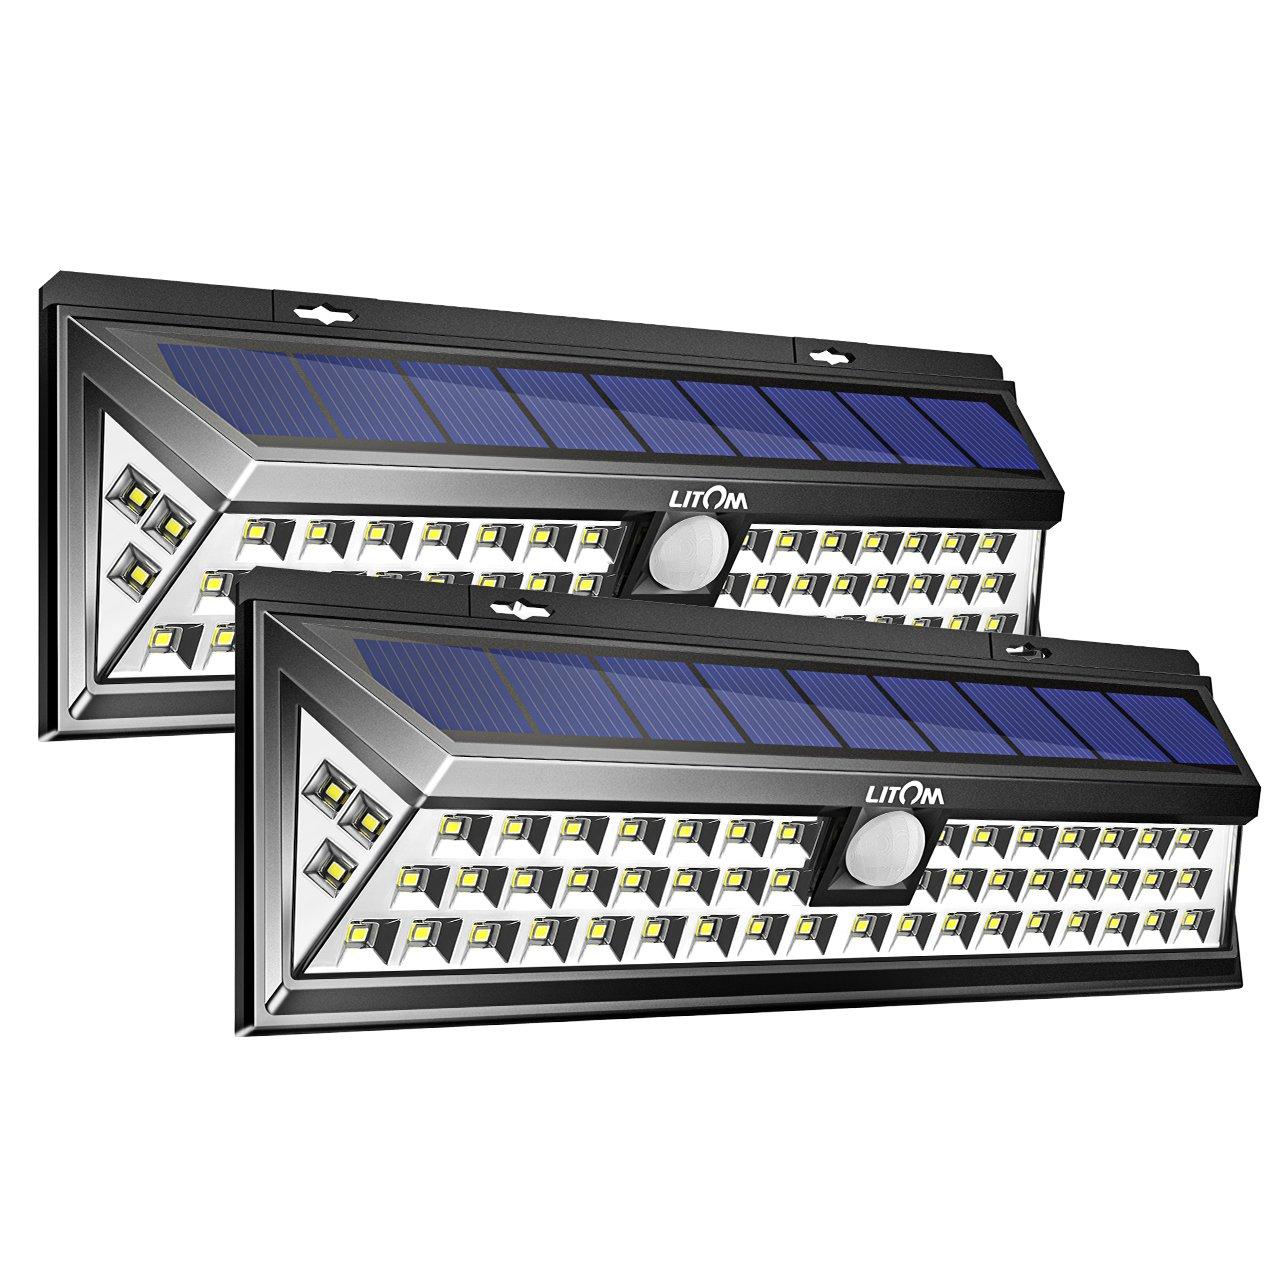 Litom 3RD-GEN Plating Solar Lights Outdoor, Super Bright Security Solar Wall Lights with Motion Sensor 54 LED for Patio, Garage, Garden, Balcony, RV(2 Pack)